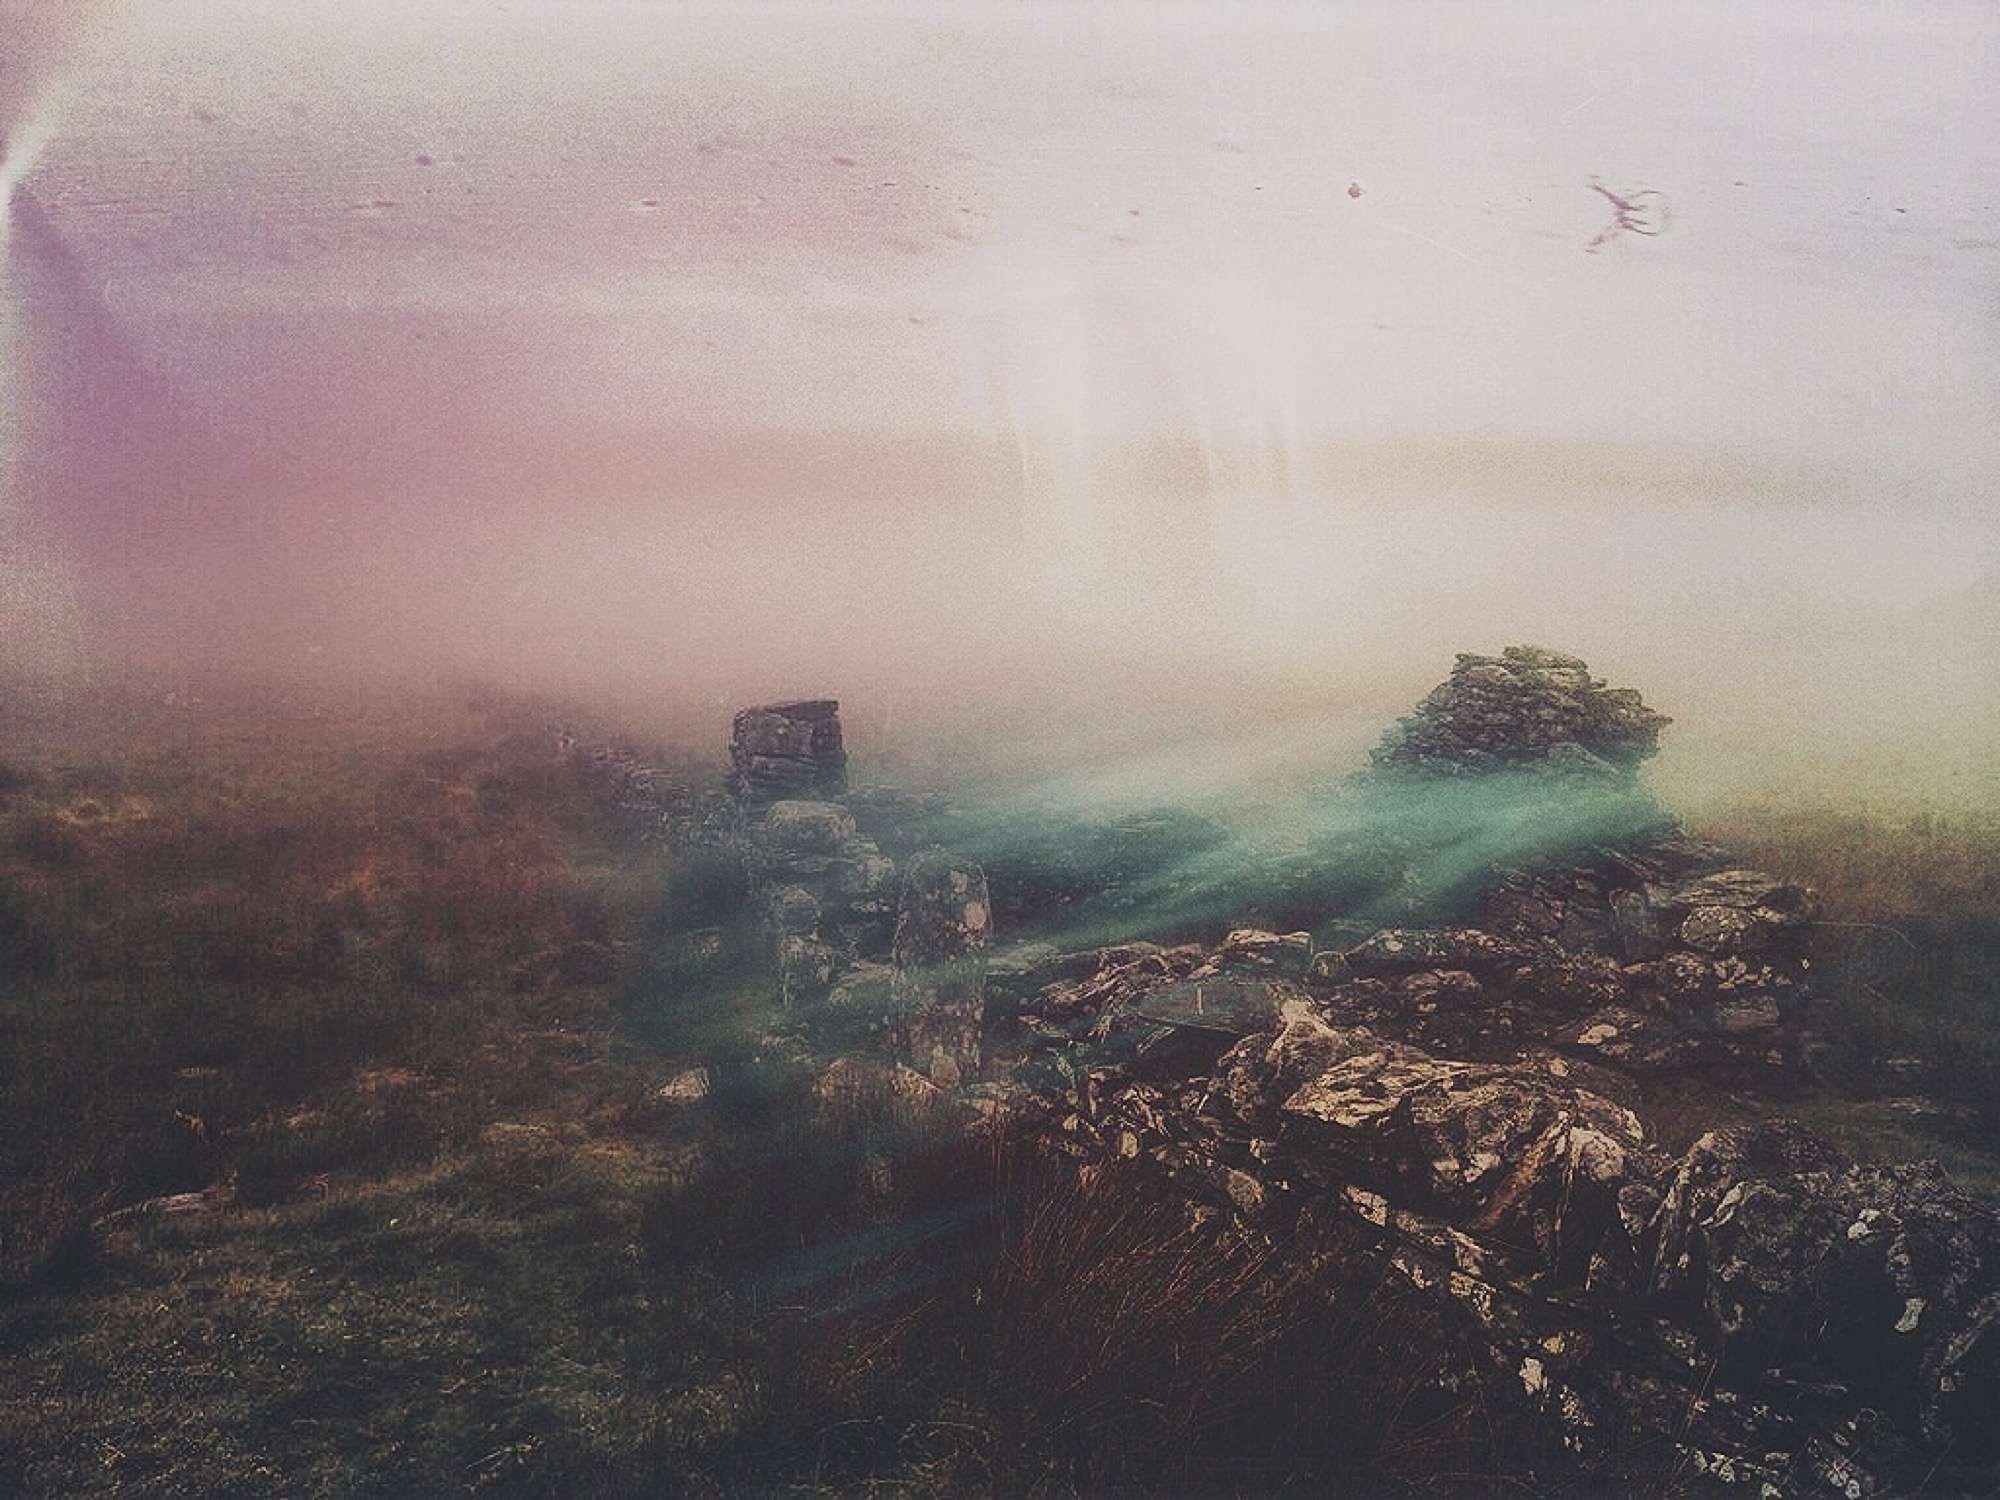 Into Mist - HWJSKEQ